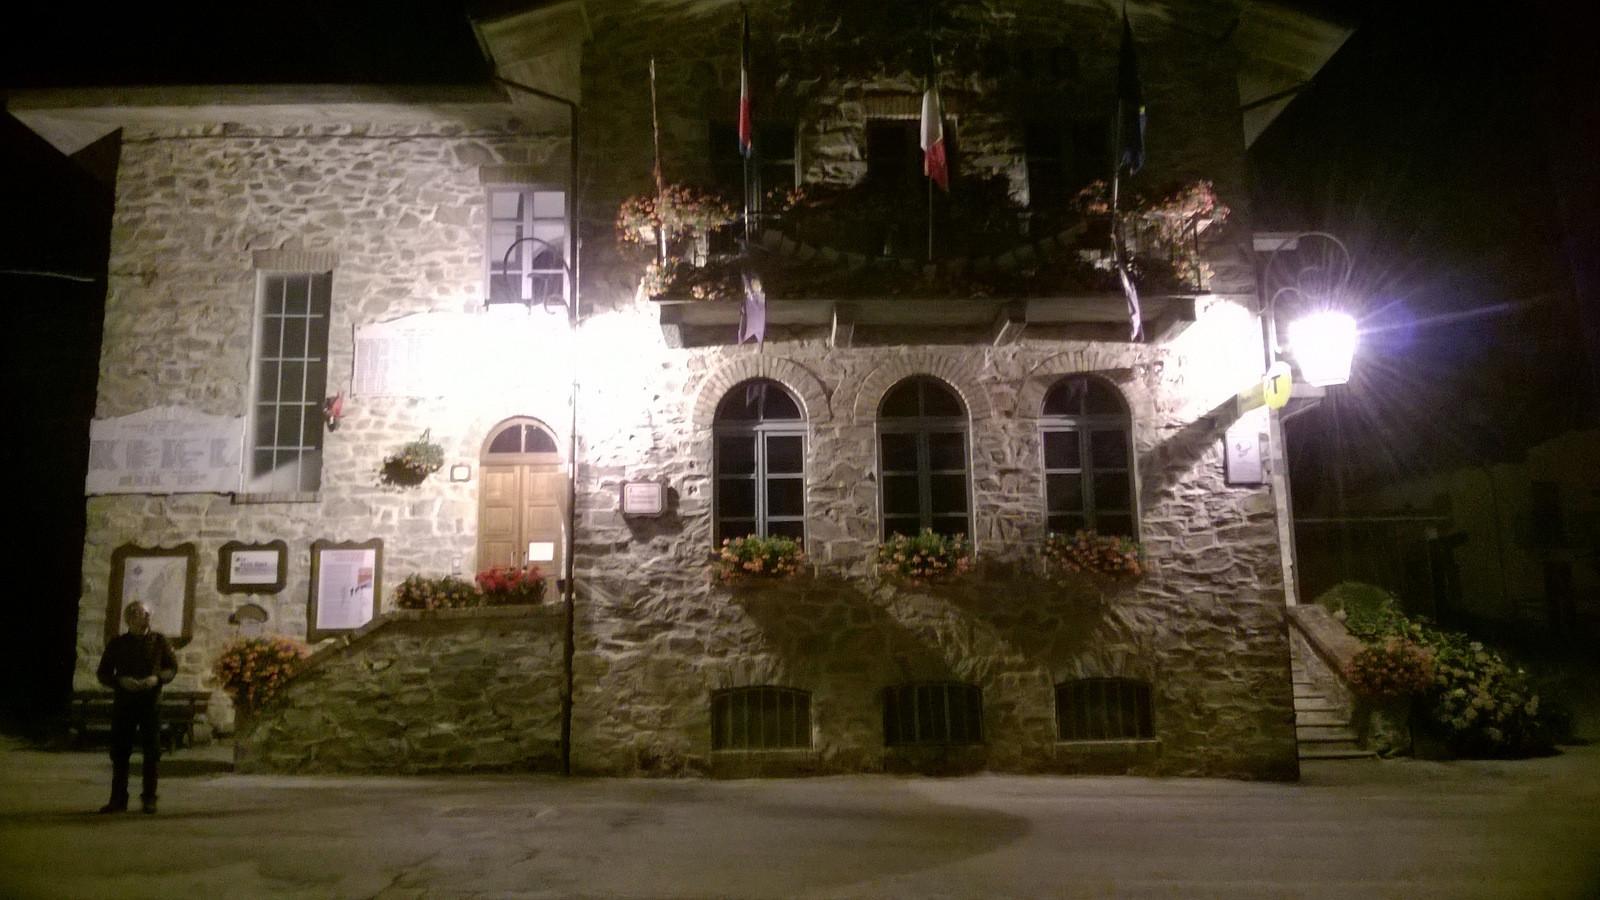 visite nocturne de Valloriate